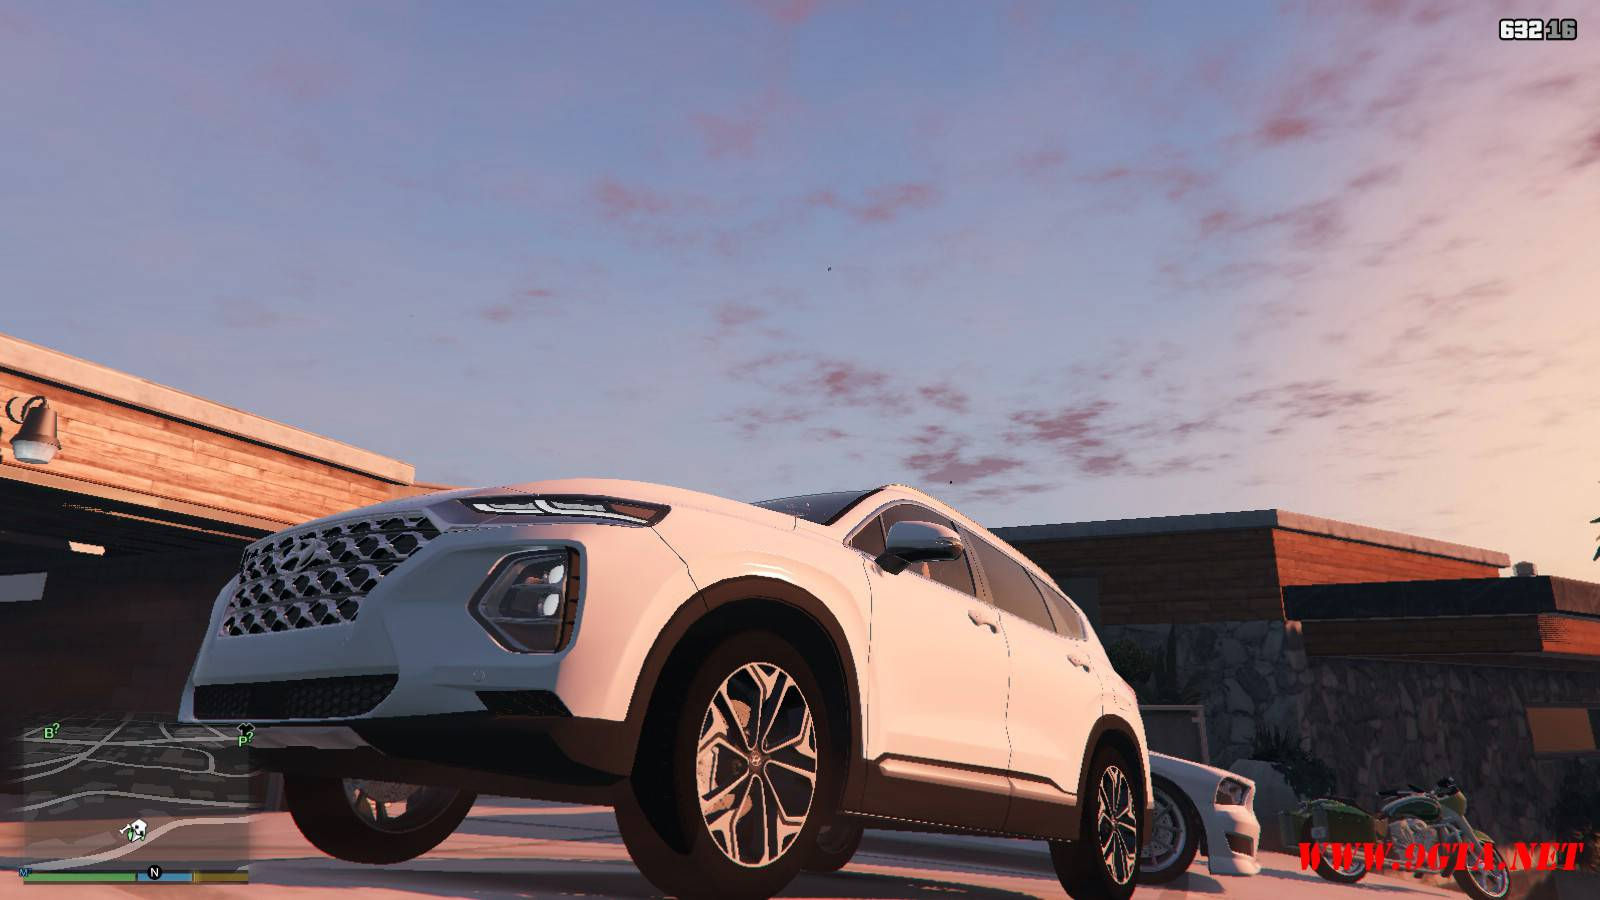 2019 Huyndai Santa Fe GTA5 mods (9)